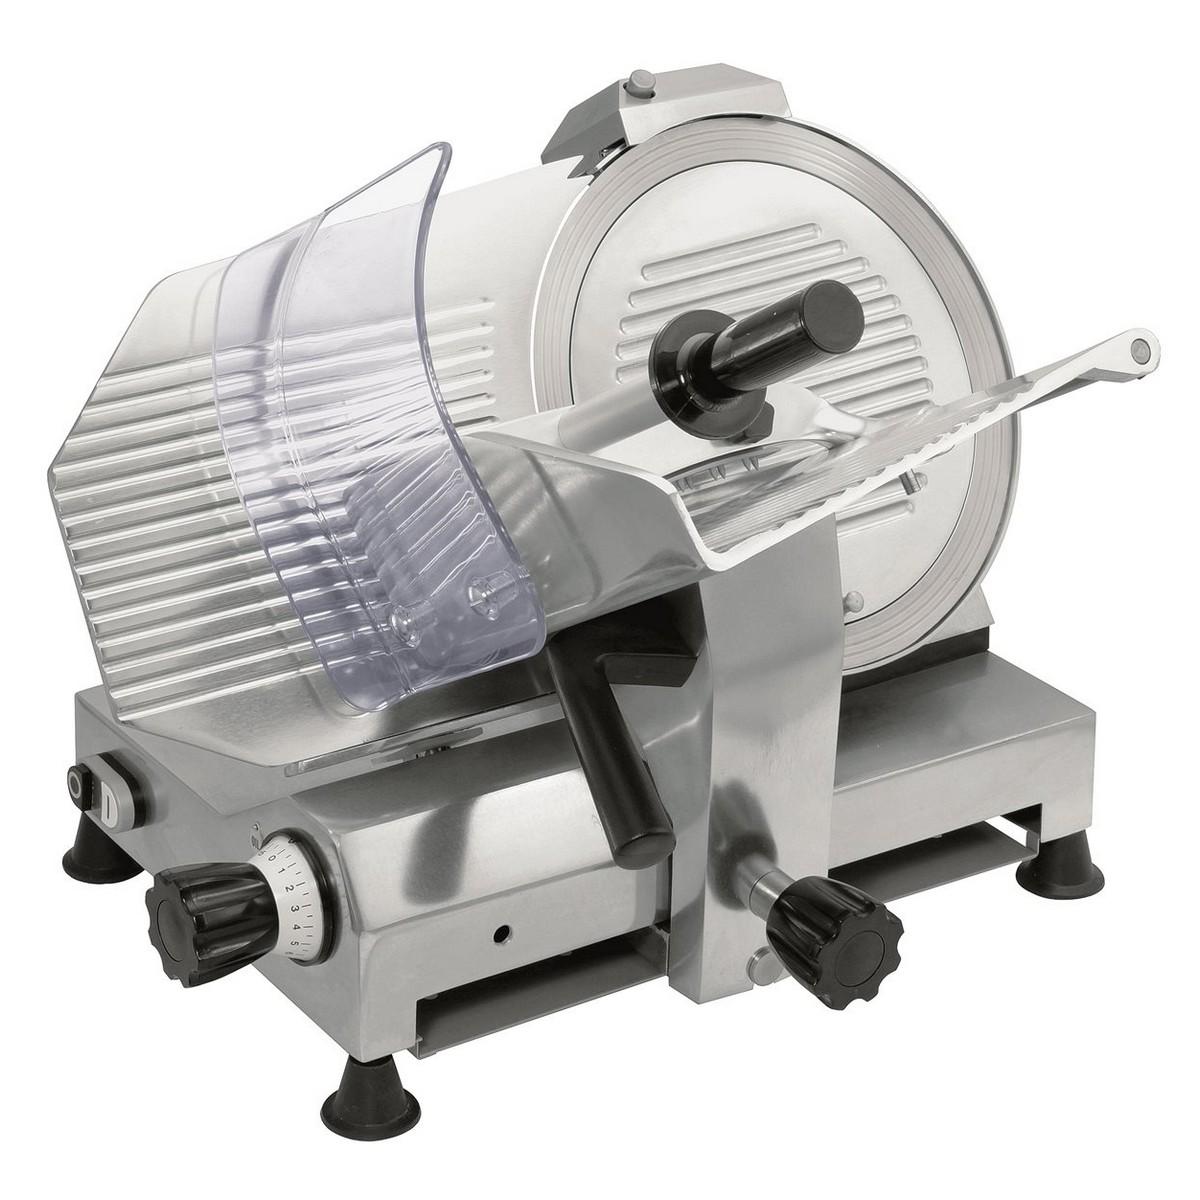 Allesschneider Modell GPR300 MN - Stahl mit verchromter Klinge Ø 300 mm